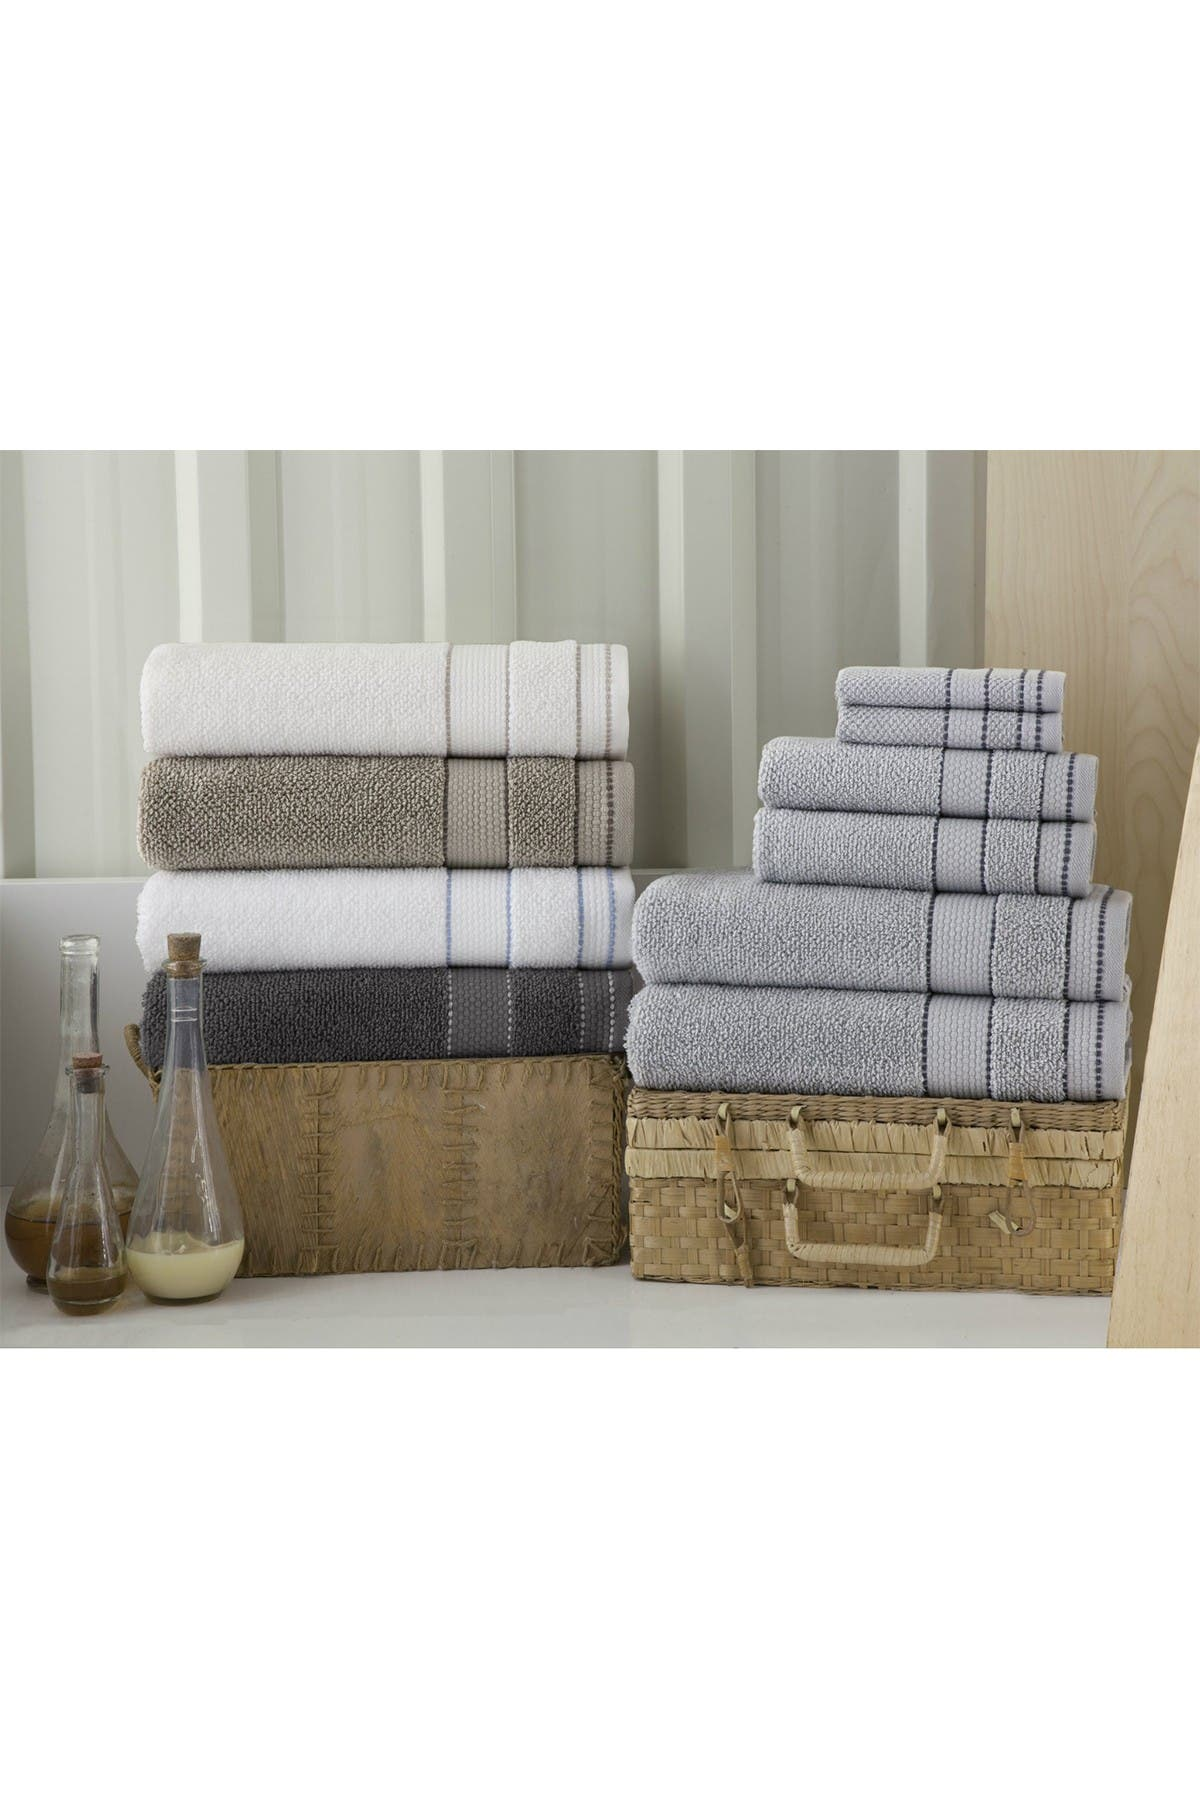 Image of ENCHANTE HOME Monroe Turkish Cotton Bath Towel - Silver - Set of 4